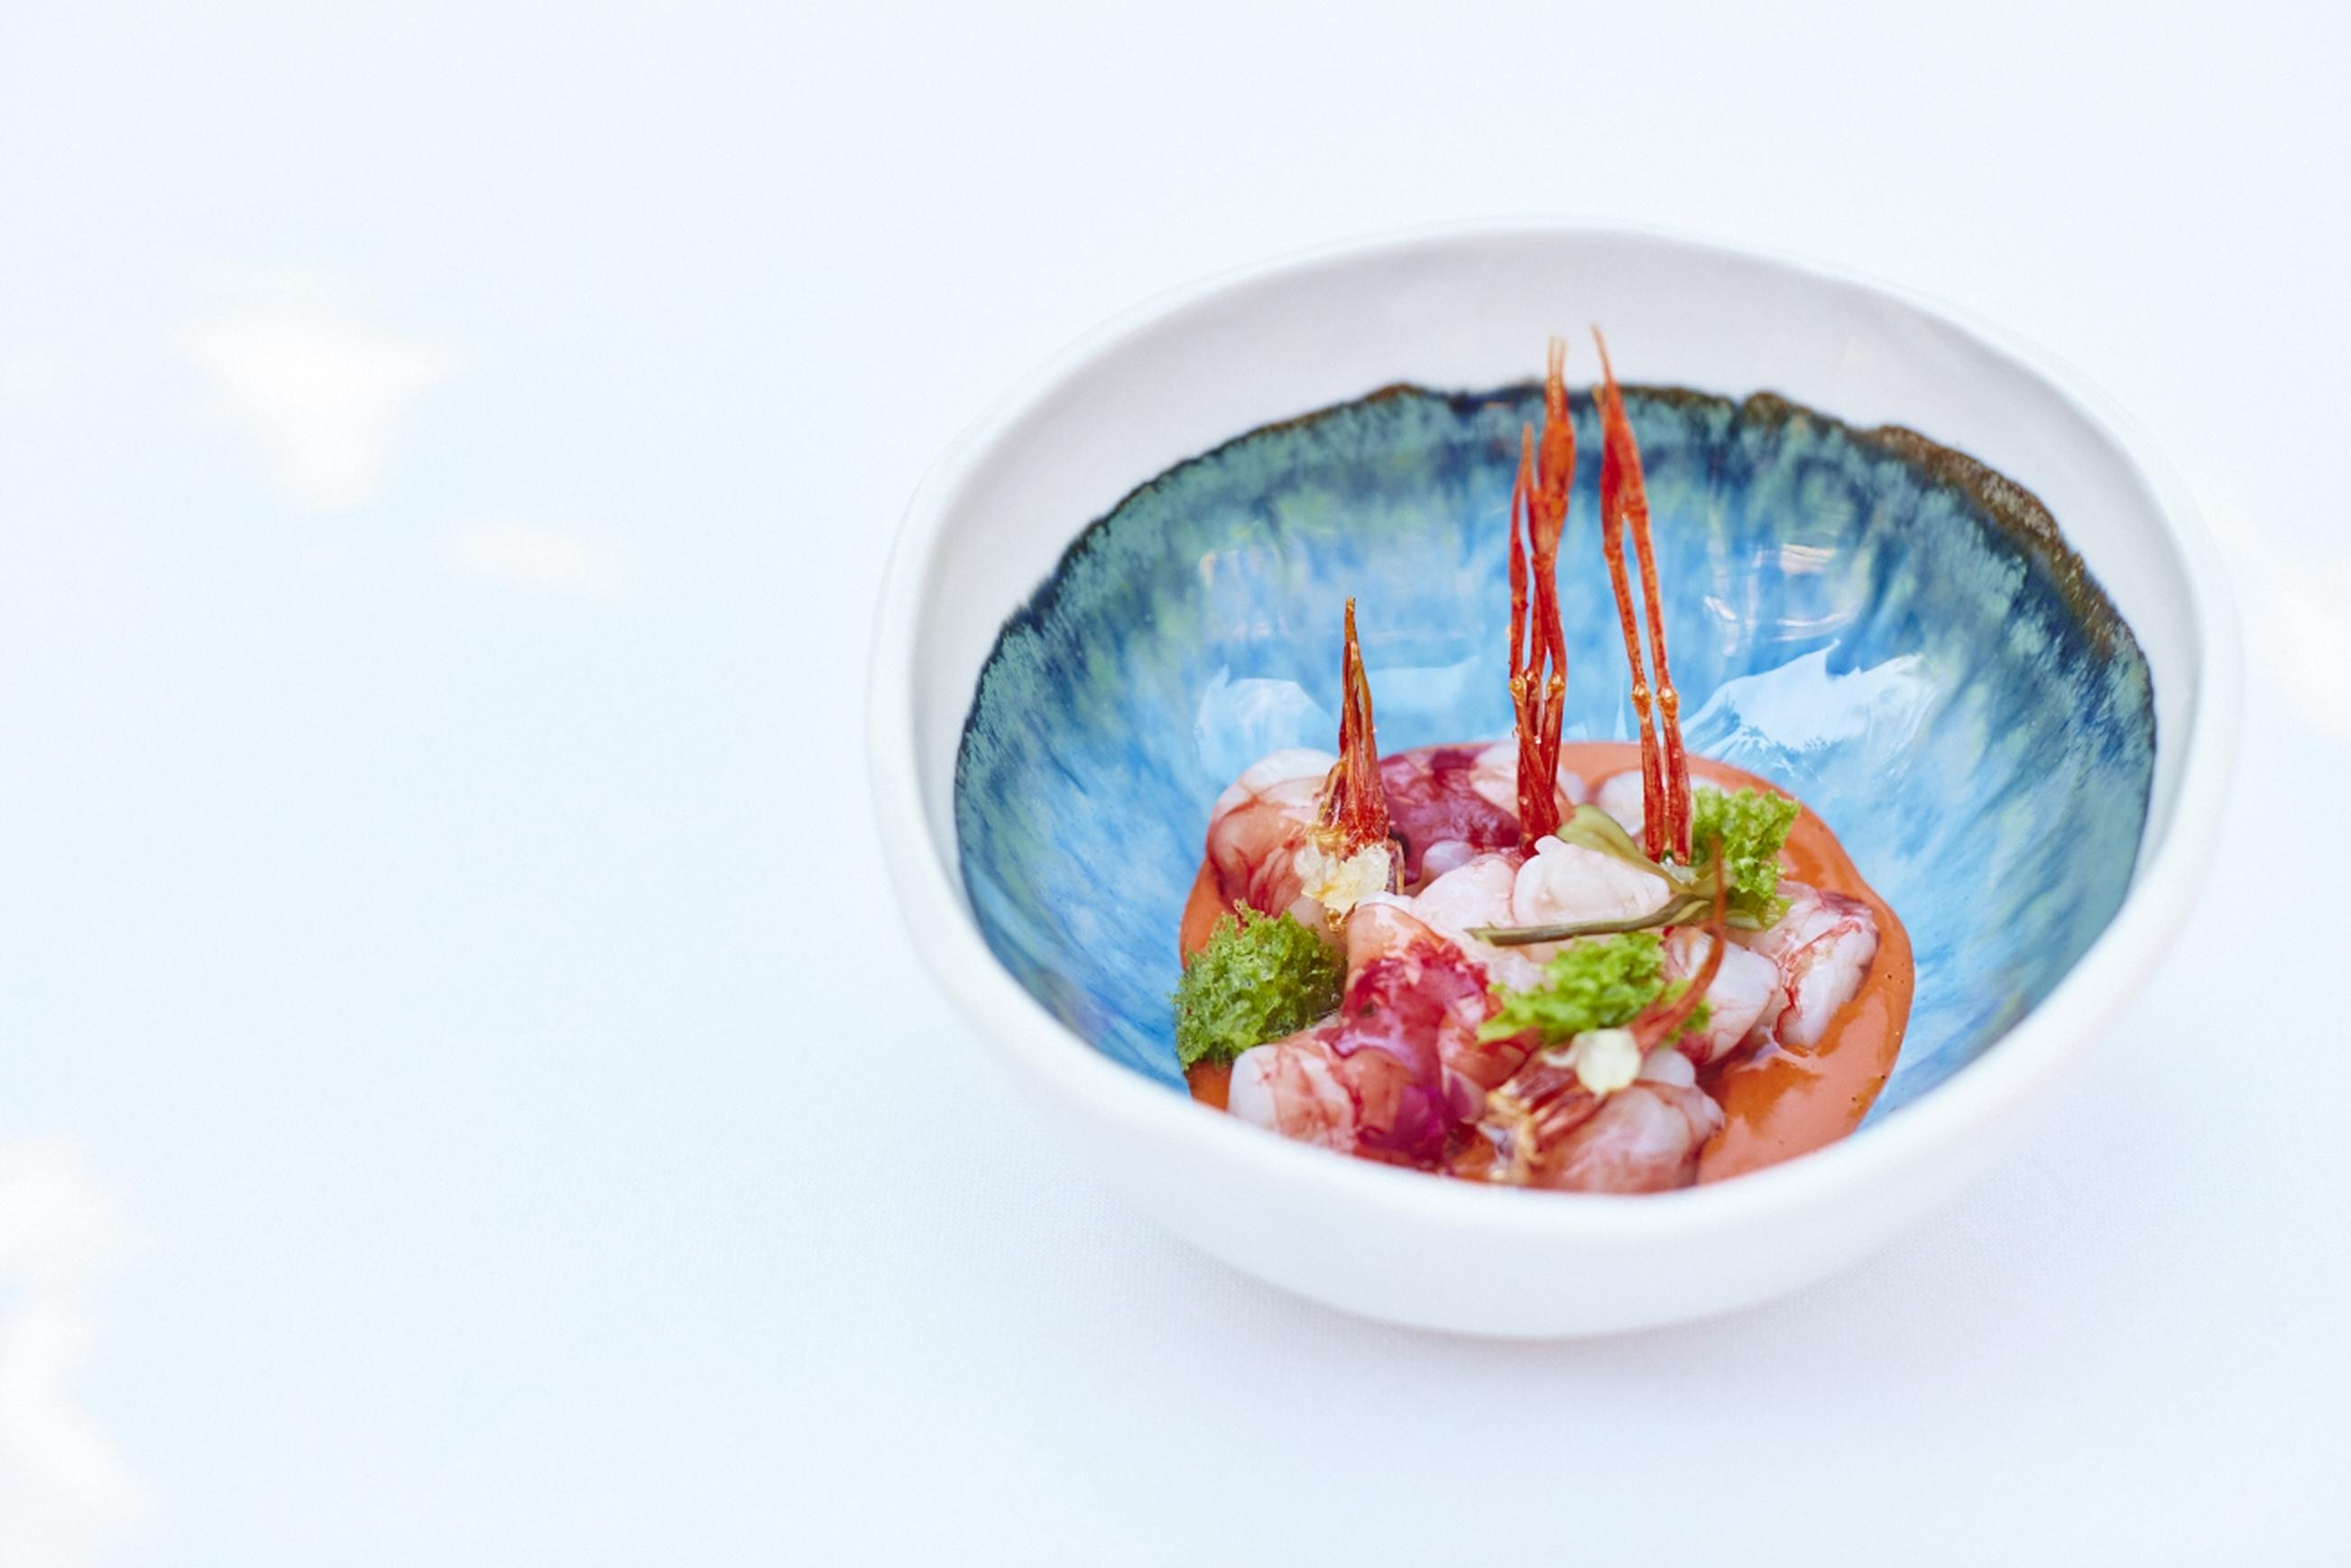 Vinegar marinated prawn and katsuobushi with crispy prawn legs, seaweed velouté and phytoplàncton-001